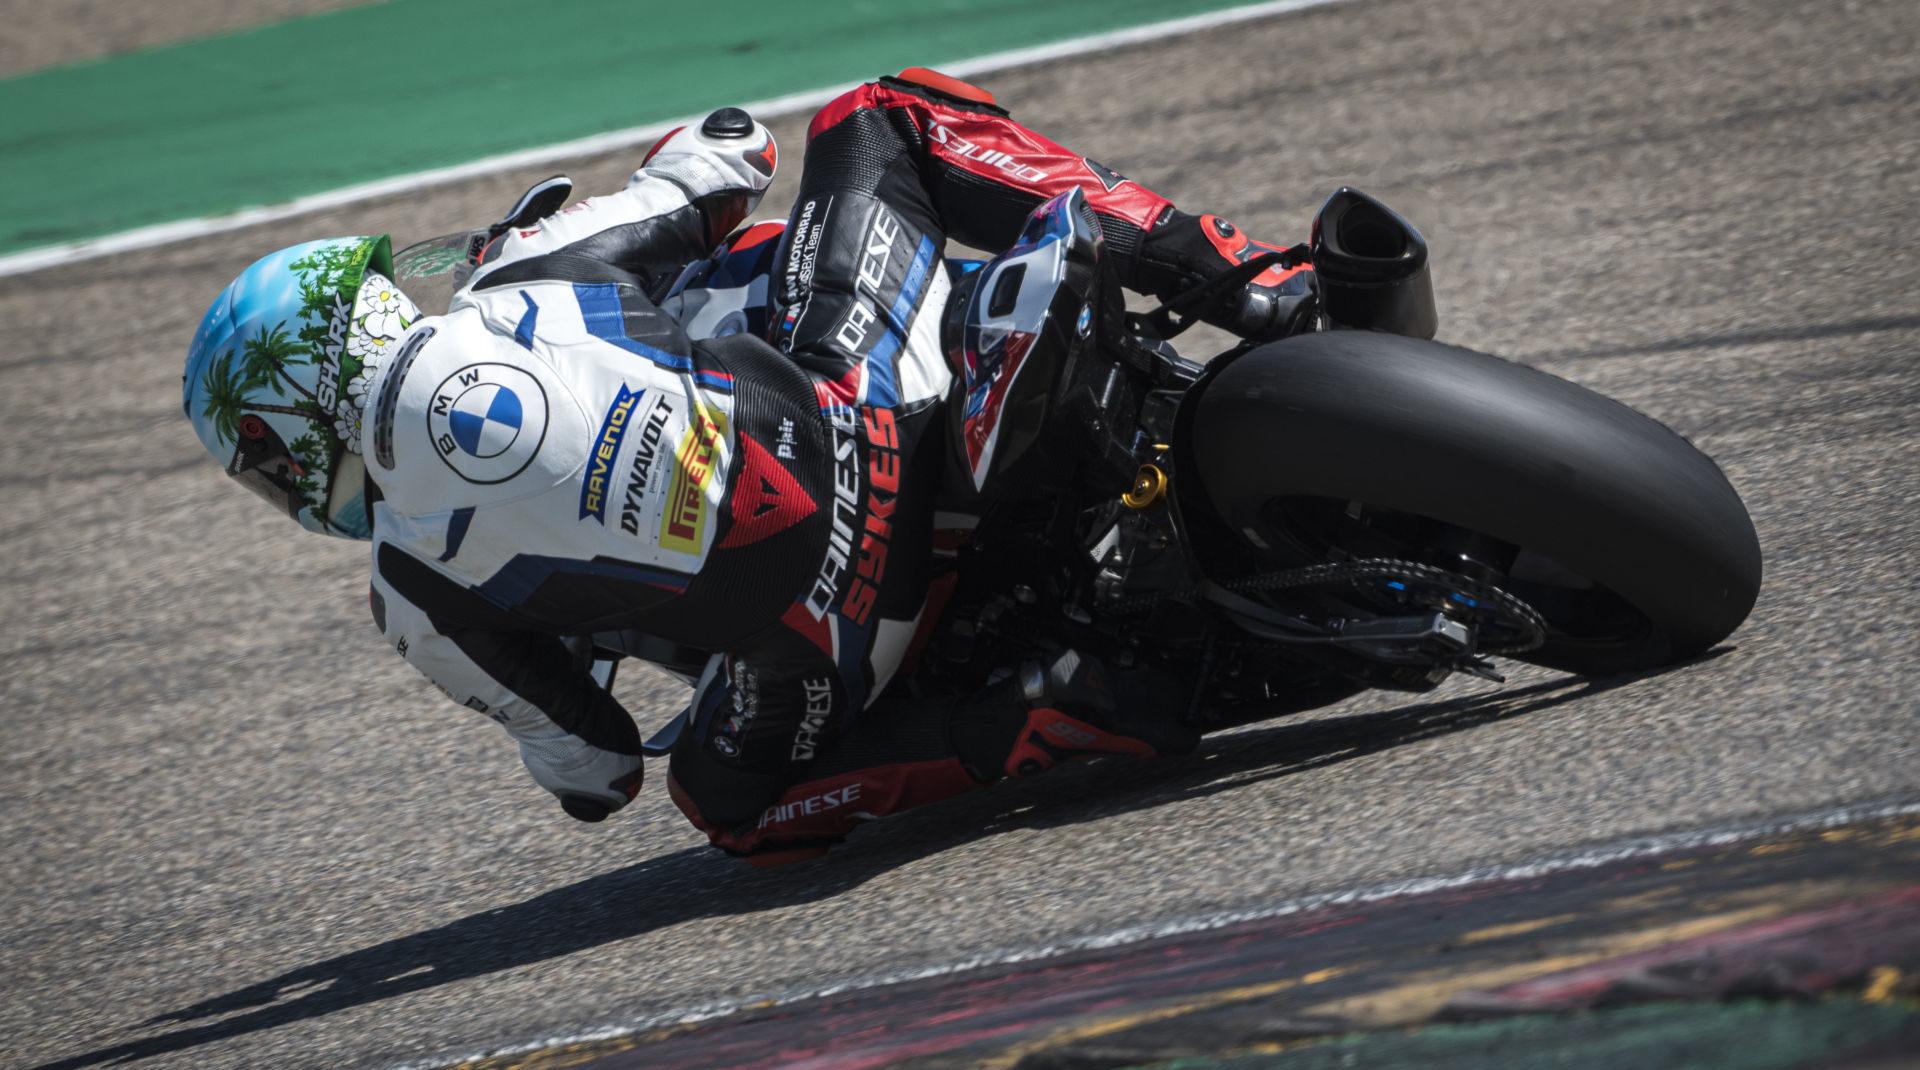 Tom Sykes, as seen earlier this week testing at Motorland Aragon. Photo courtesy BMW Motorrad Motorsport.